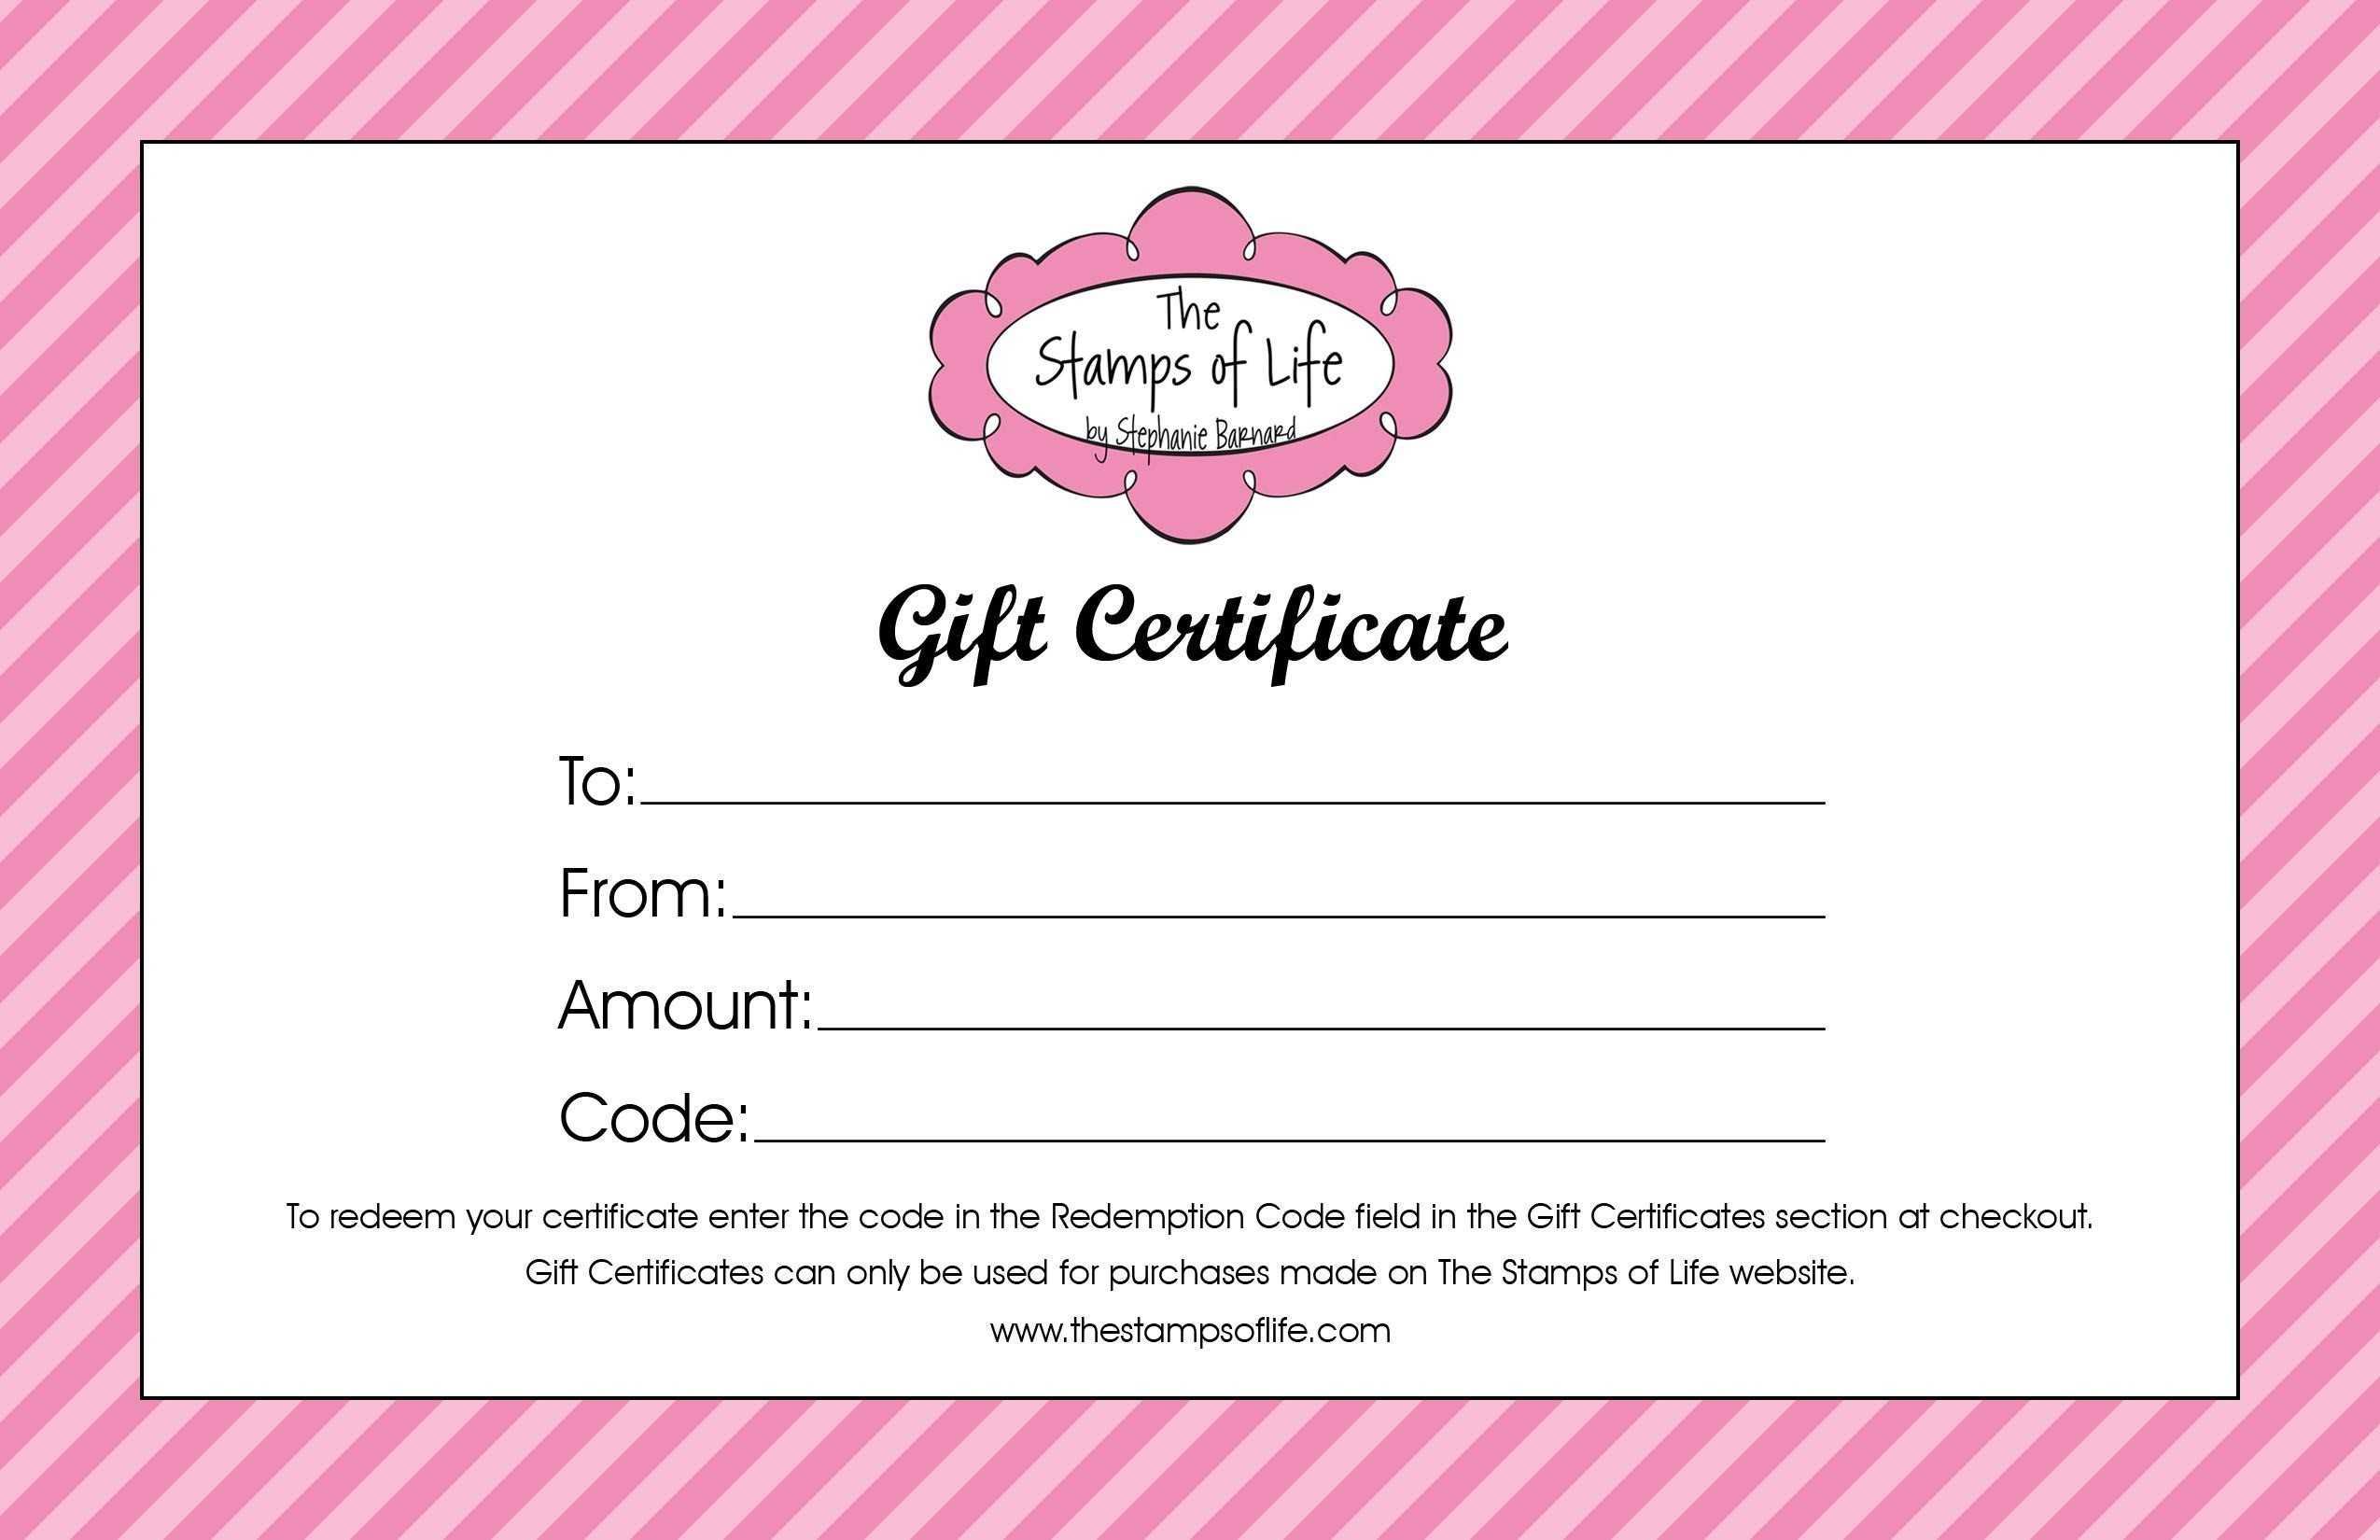 Pedicure Gift Certificate Template - Carlynstudio Pertaining To Nail Gift Certificate Template Free